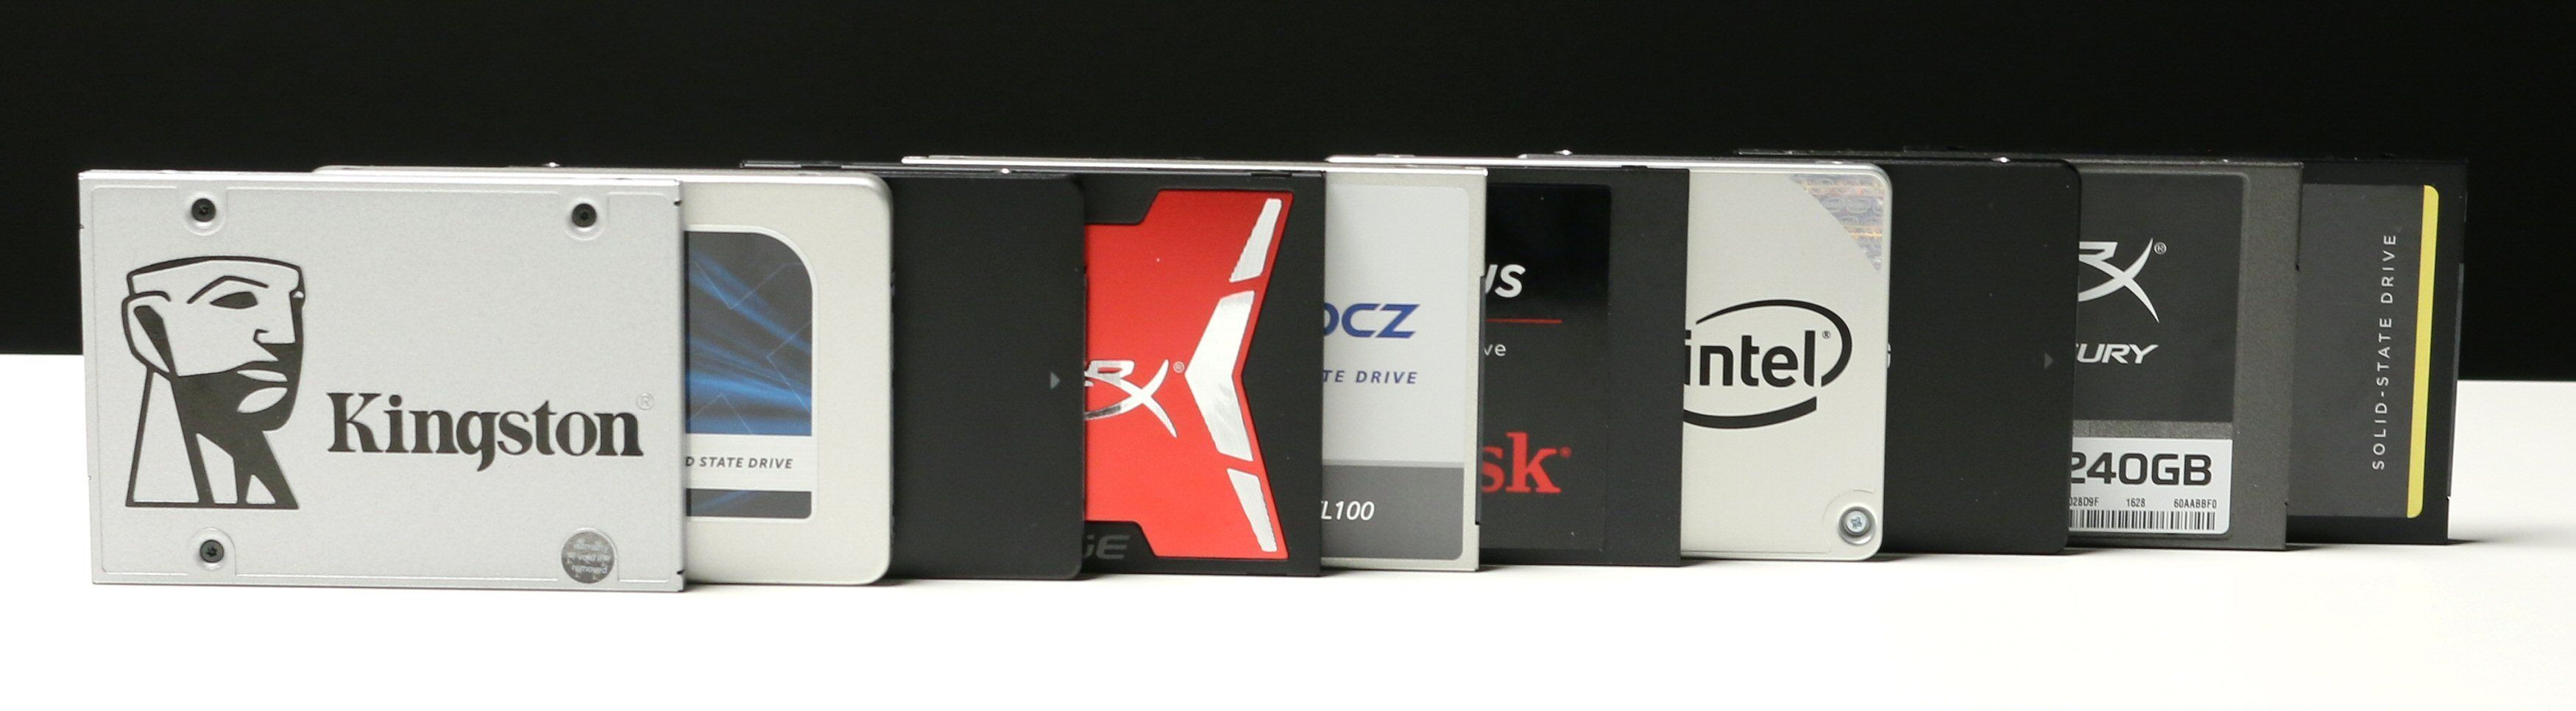 Disse er med: Kingston SSDNow UV400, Crucial MX300, Samsung 850 Evo, HyperX Savage, OCZ TL100, SanDisk SSD Plus, Intel 540s, Samsung 750 Evo, HyperX Fury og Corsair Force LE.